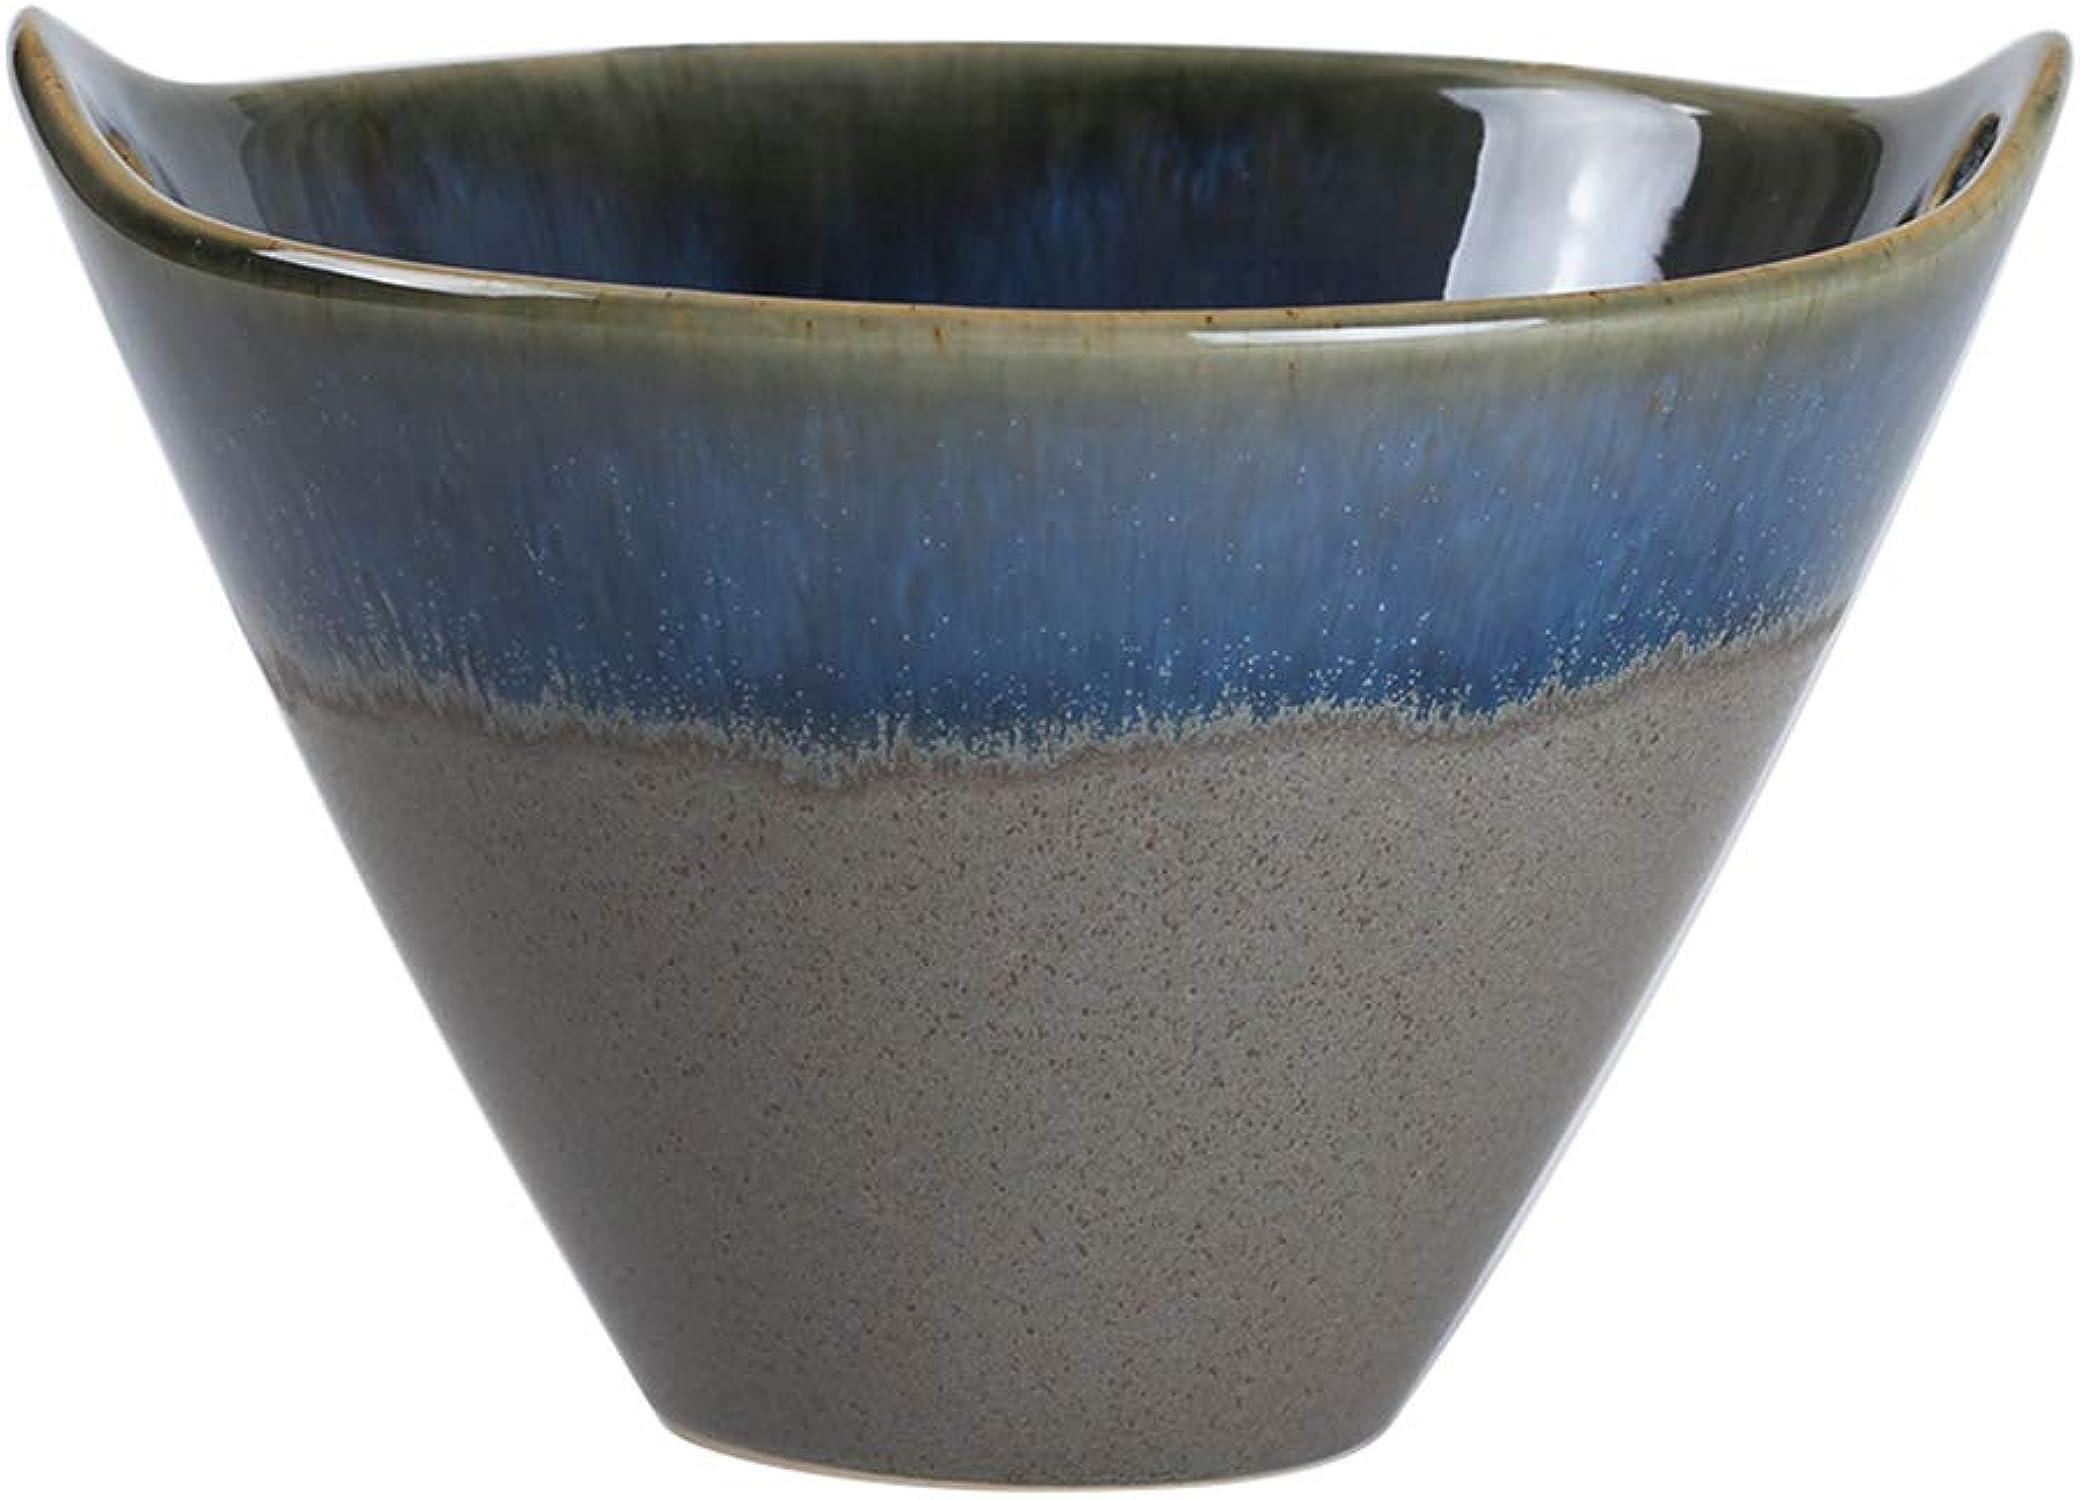 Bol japonais créatif bleu four changeHommest seau forme sacuettes sacuettes binaural salade bol ménage raHommes bol soupe bol en céramique bol bol (Couleur   6912001000)